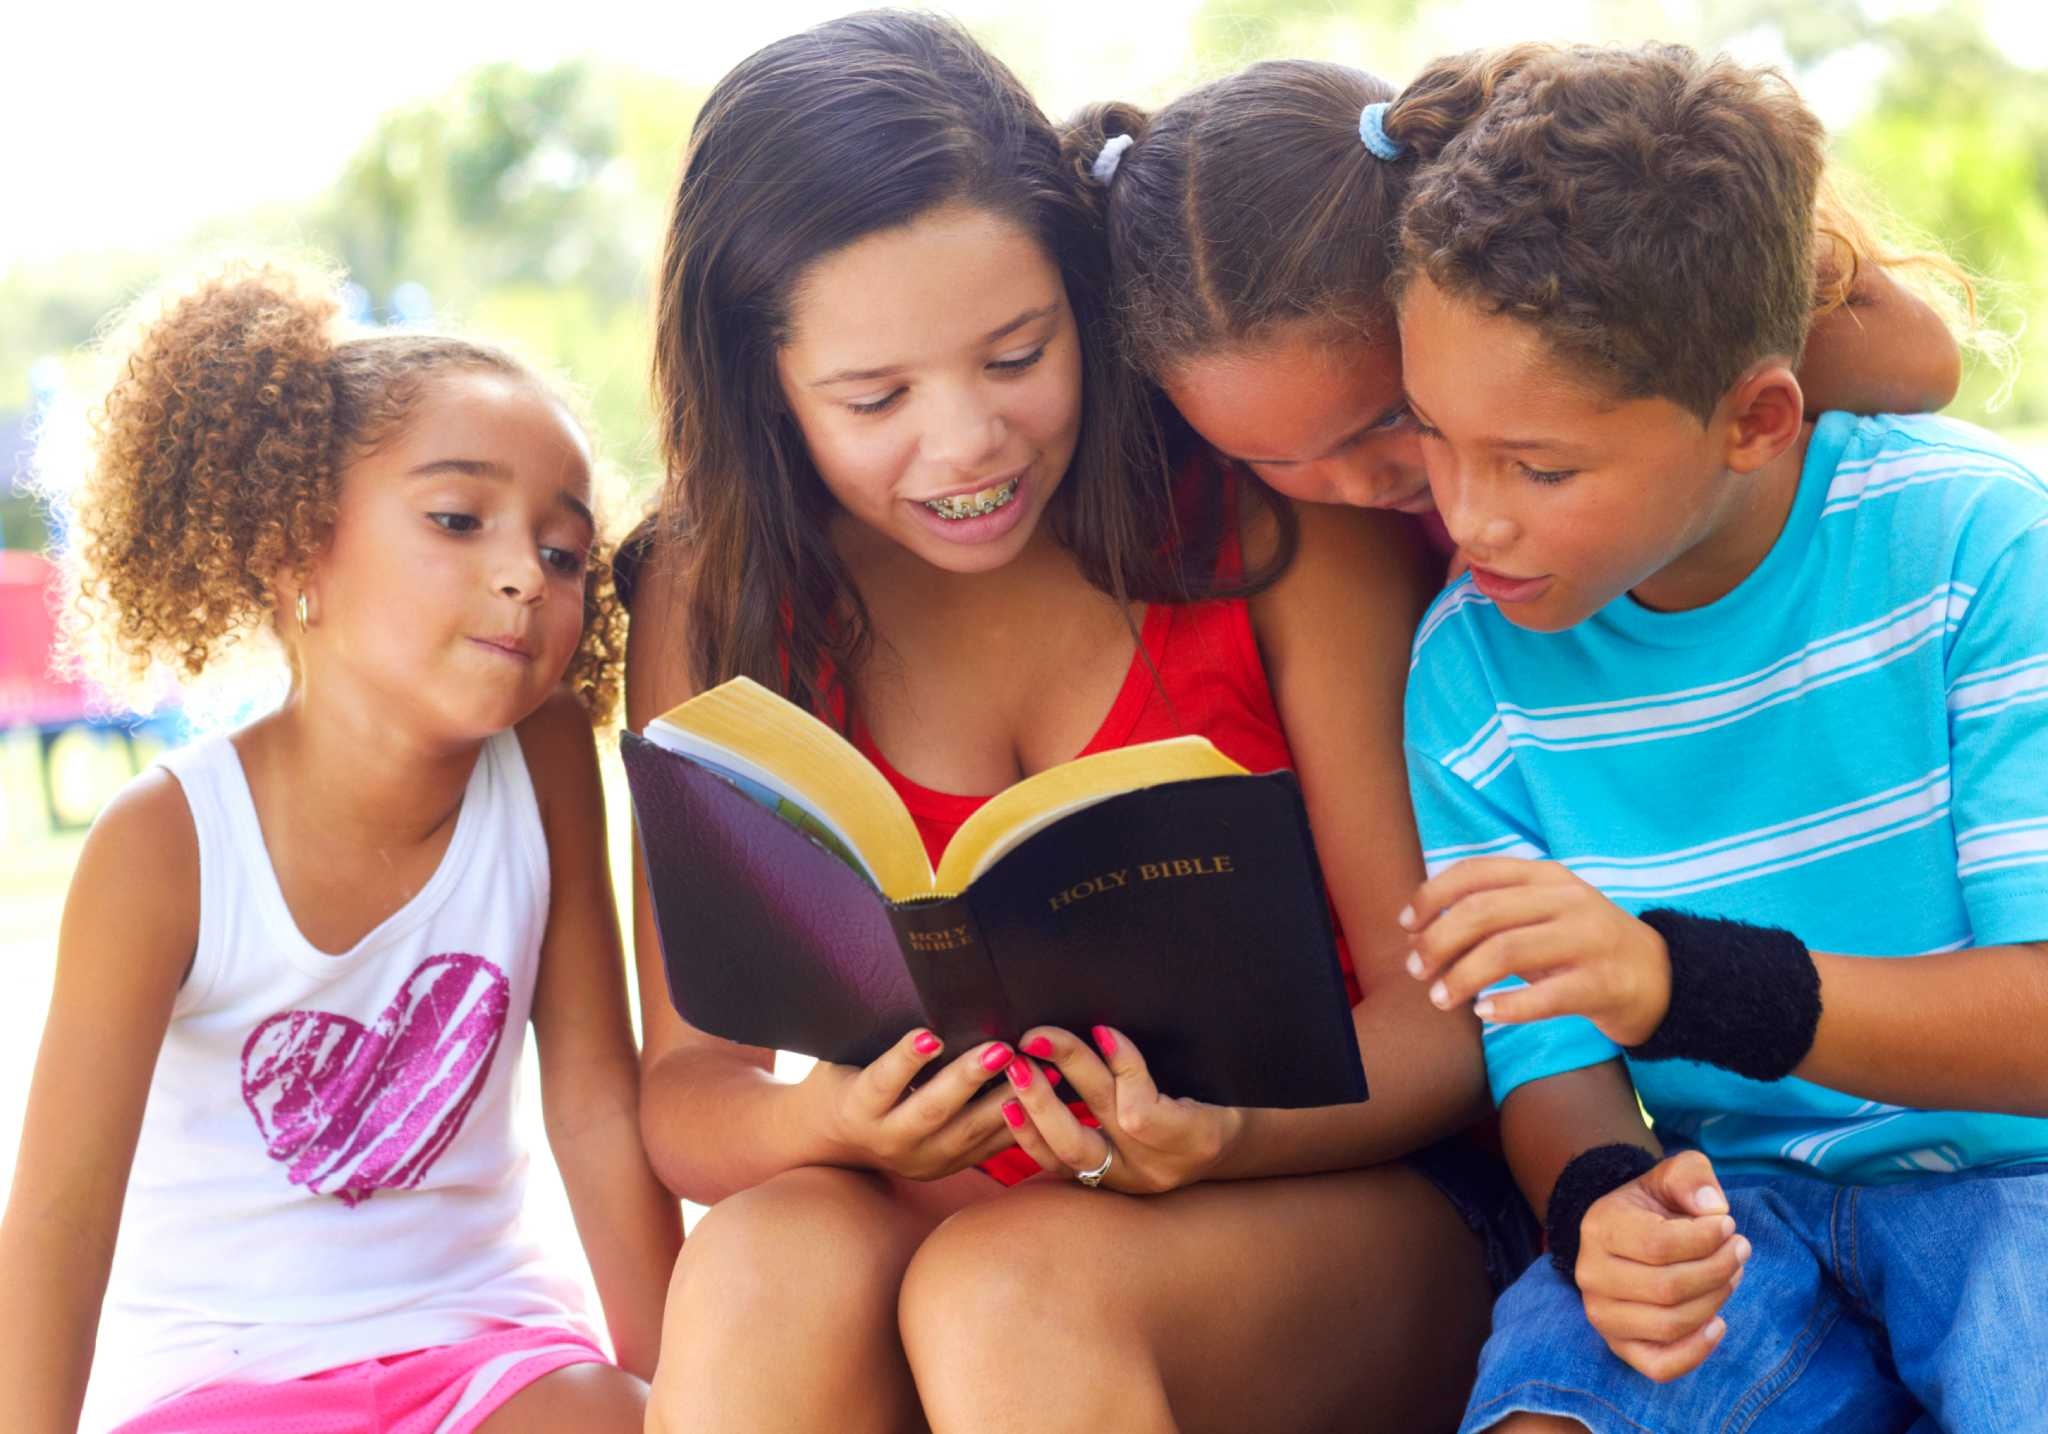 Faith based grants to train teenage girls 3